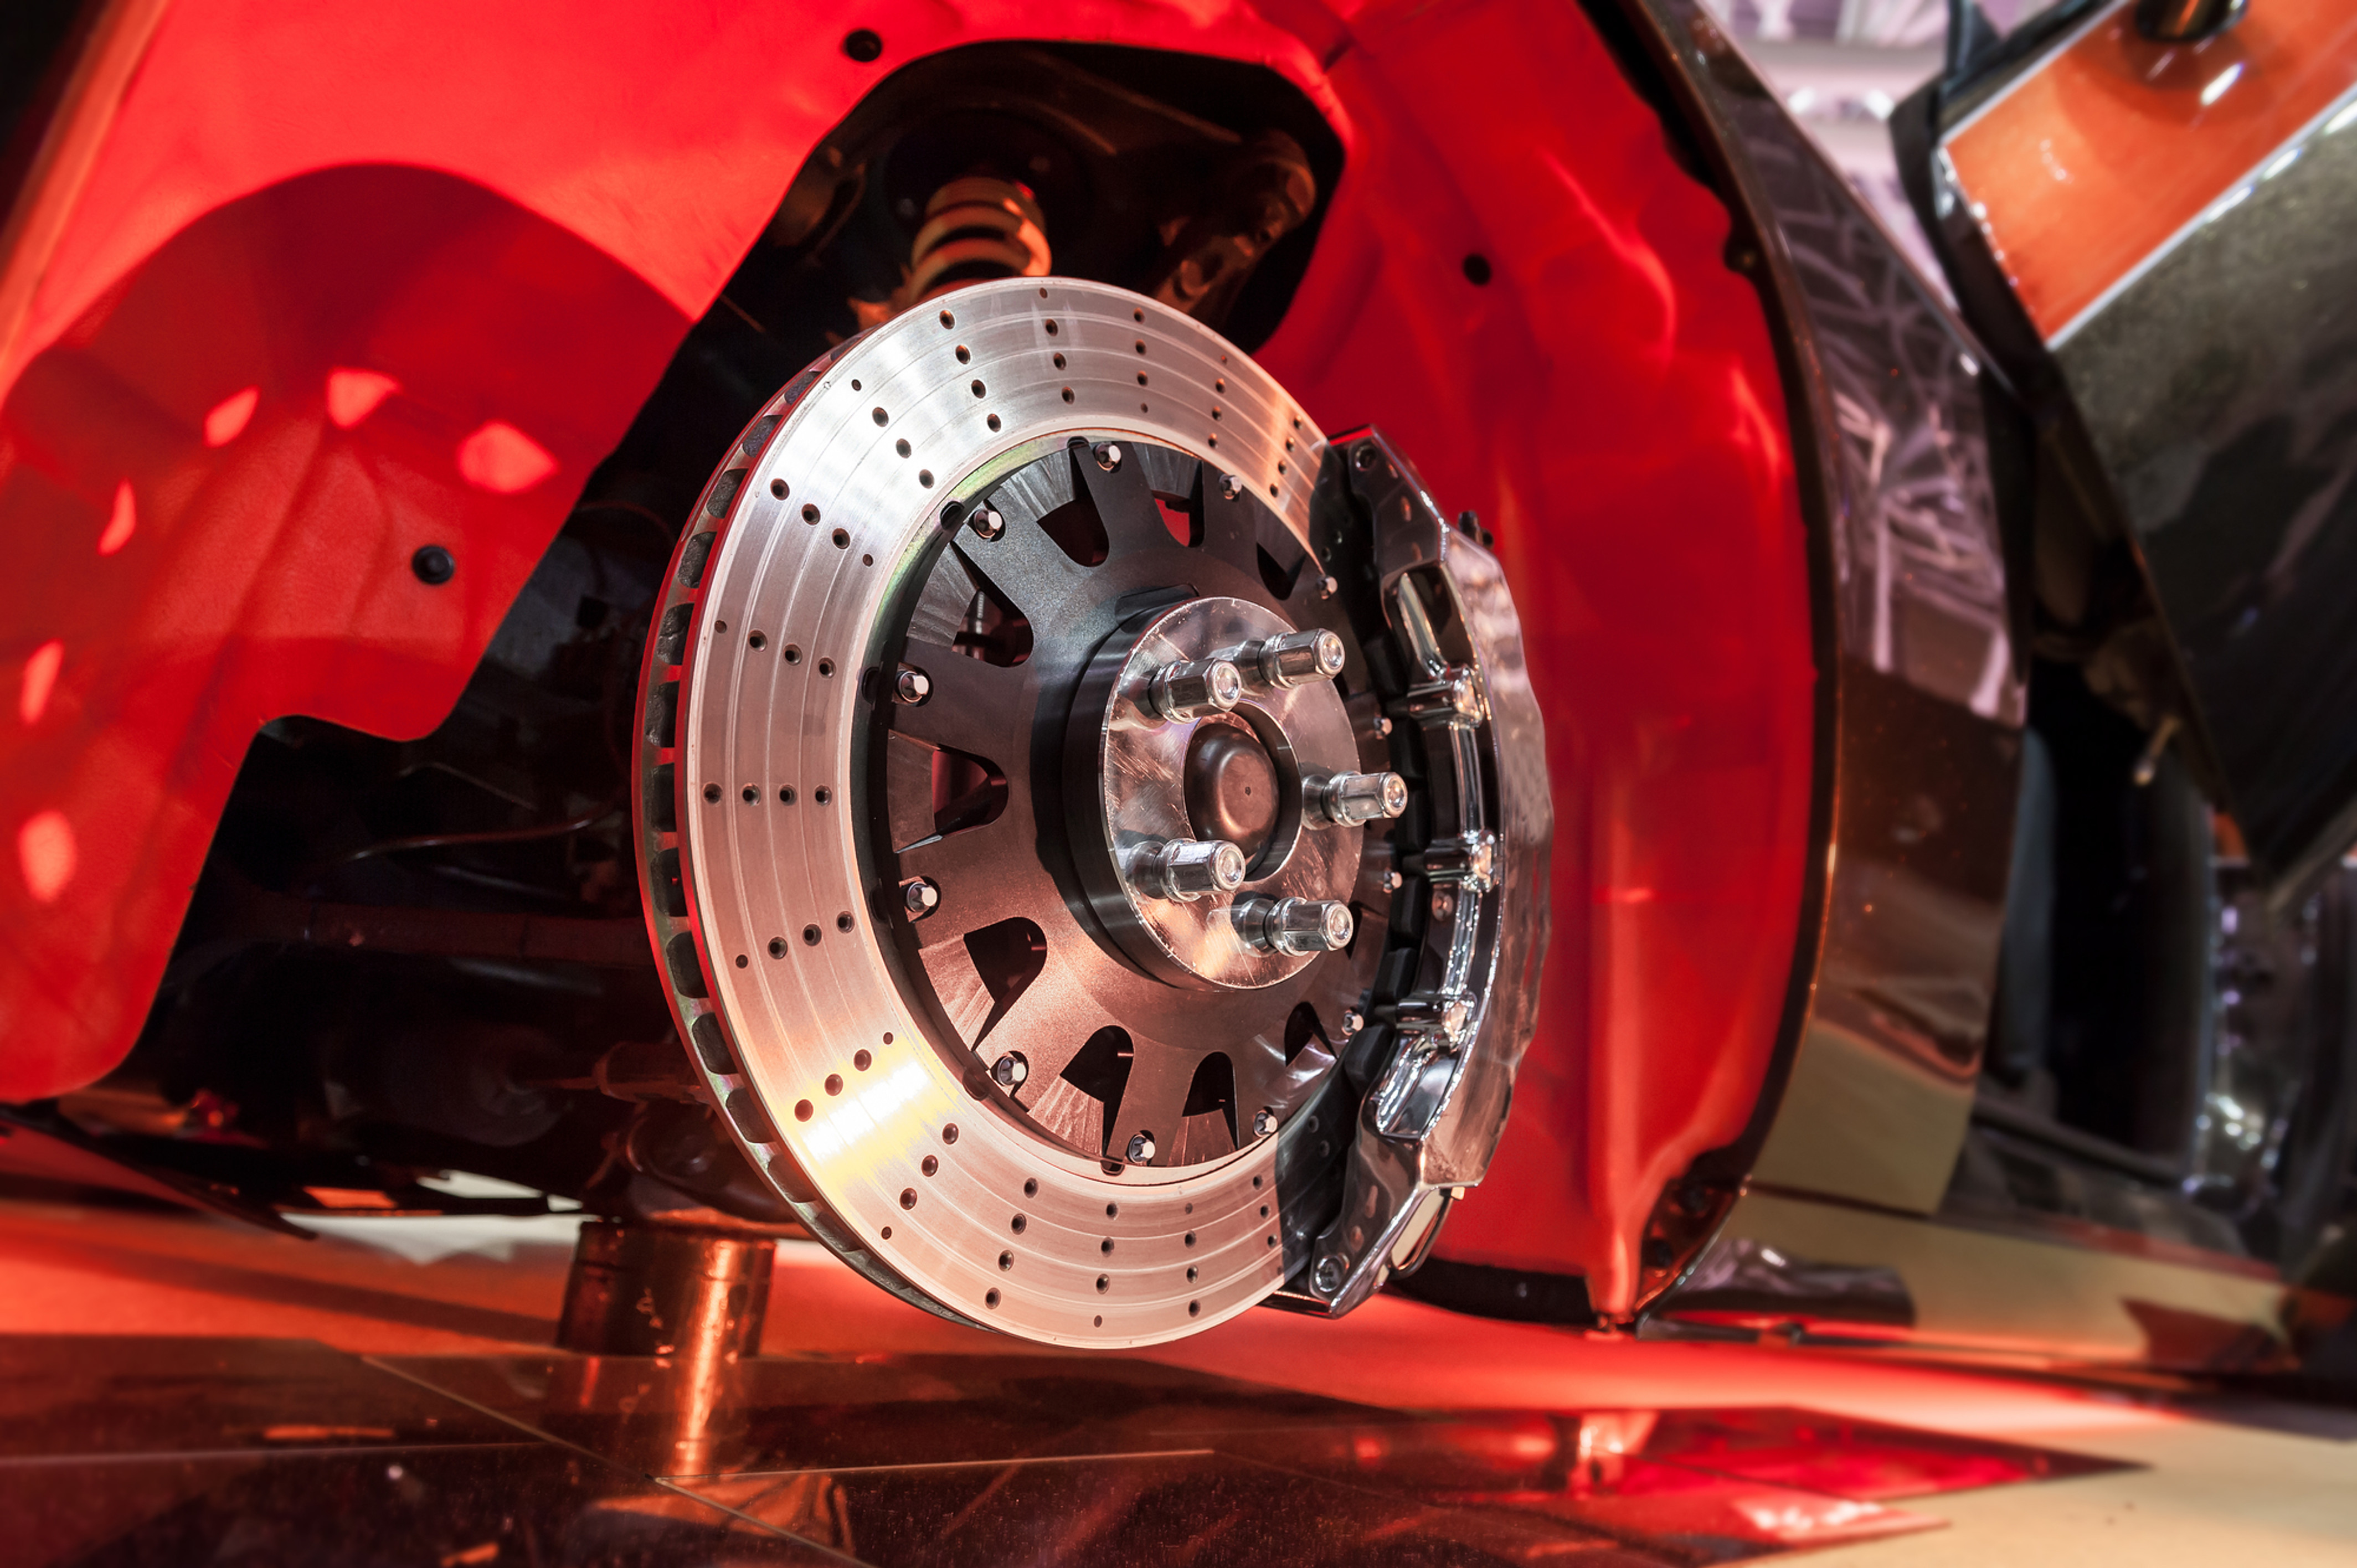 S W Mechanics Change complete Brakes